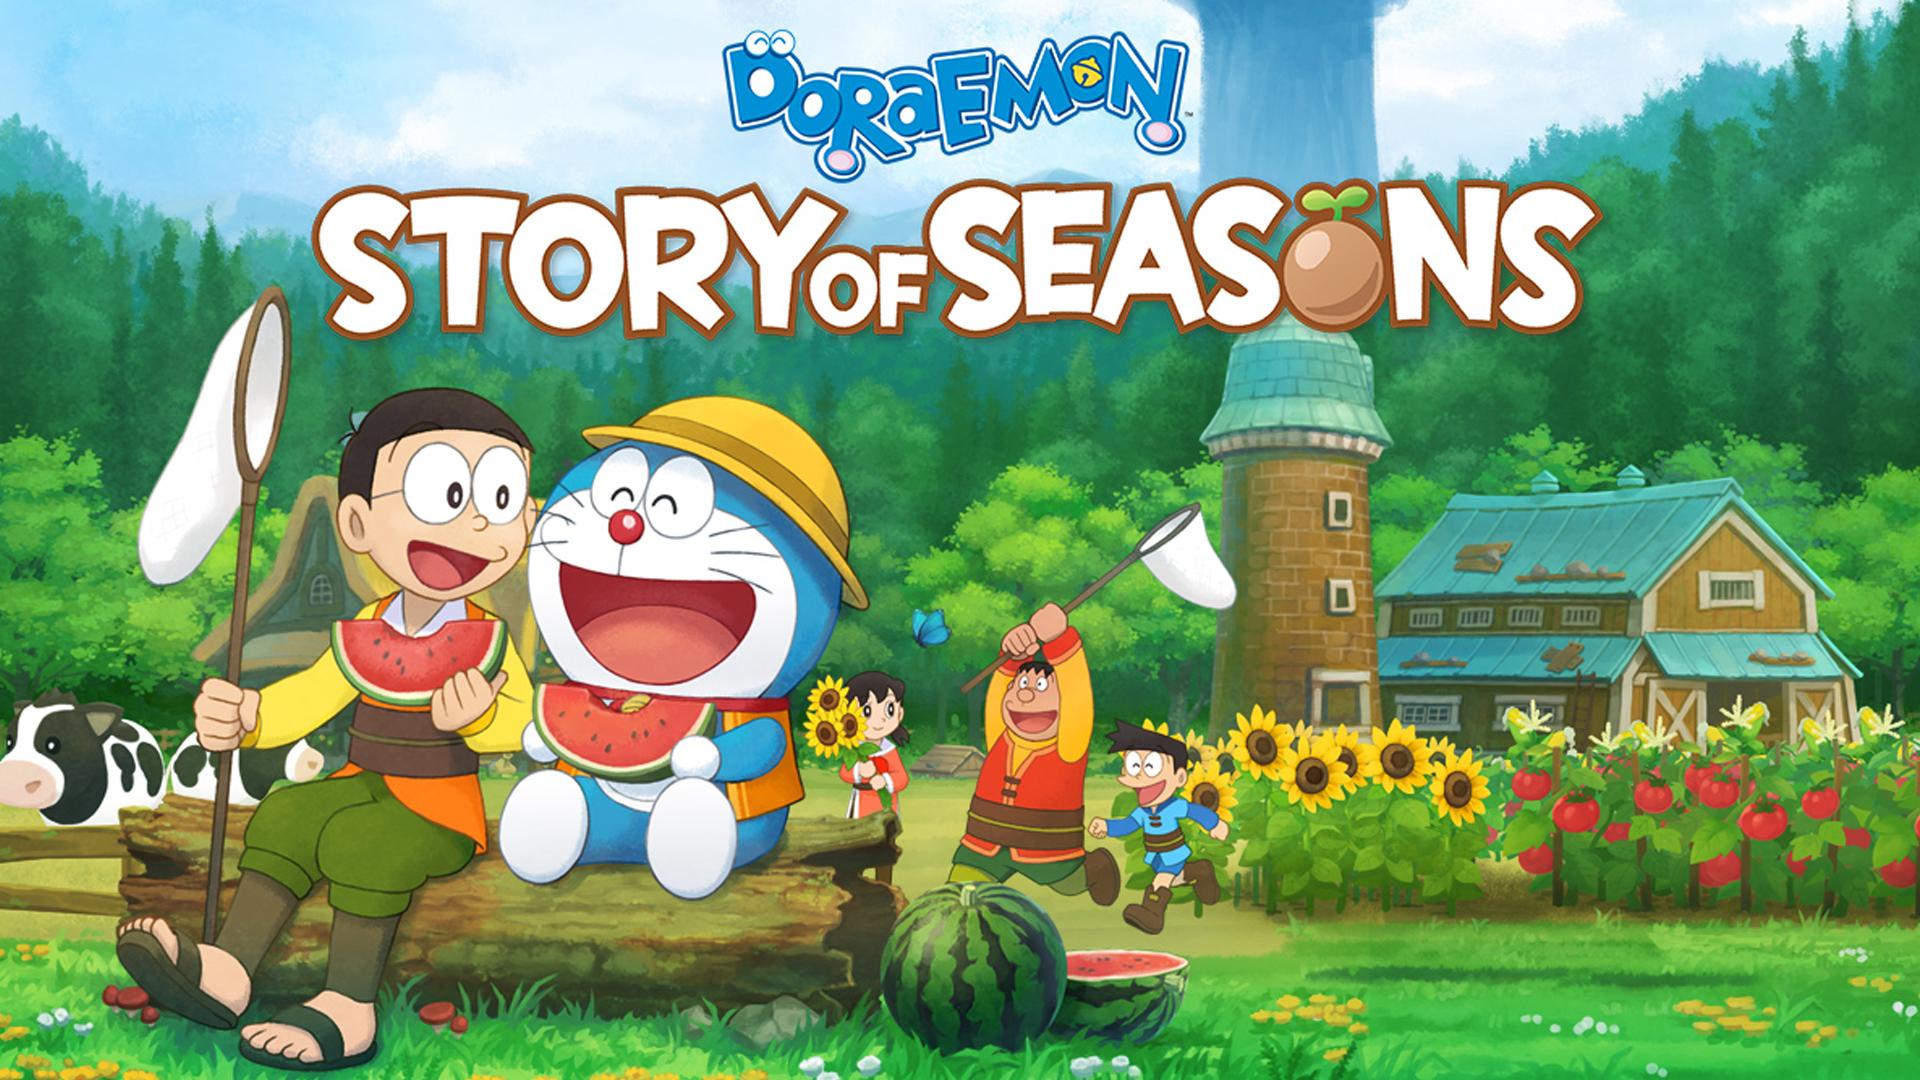 Doraemon Story of Seasons PC vs. Nintendo Switch - What to